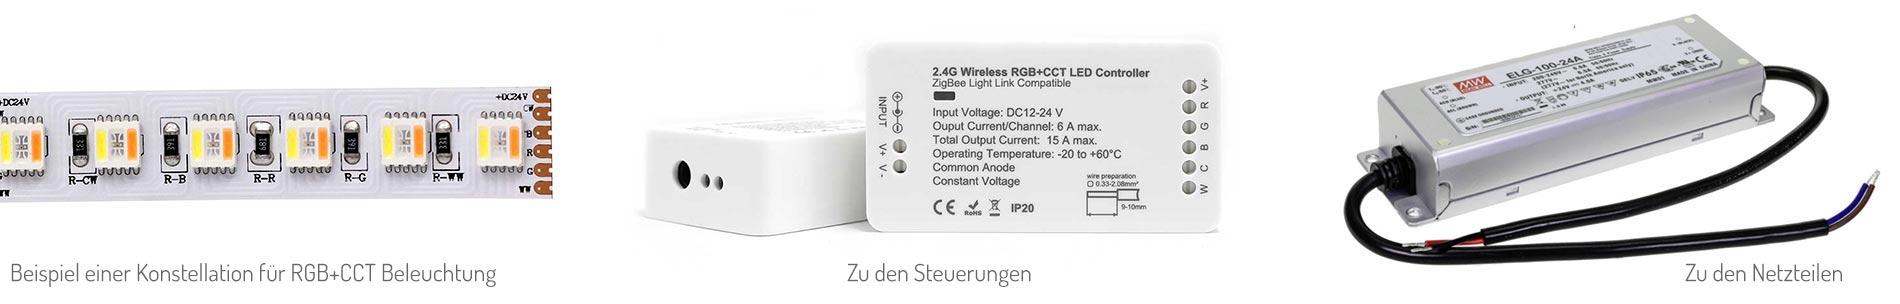 Lichtband RGBCCT